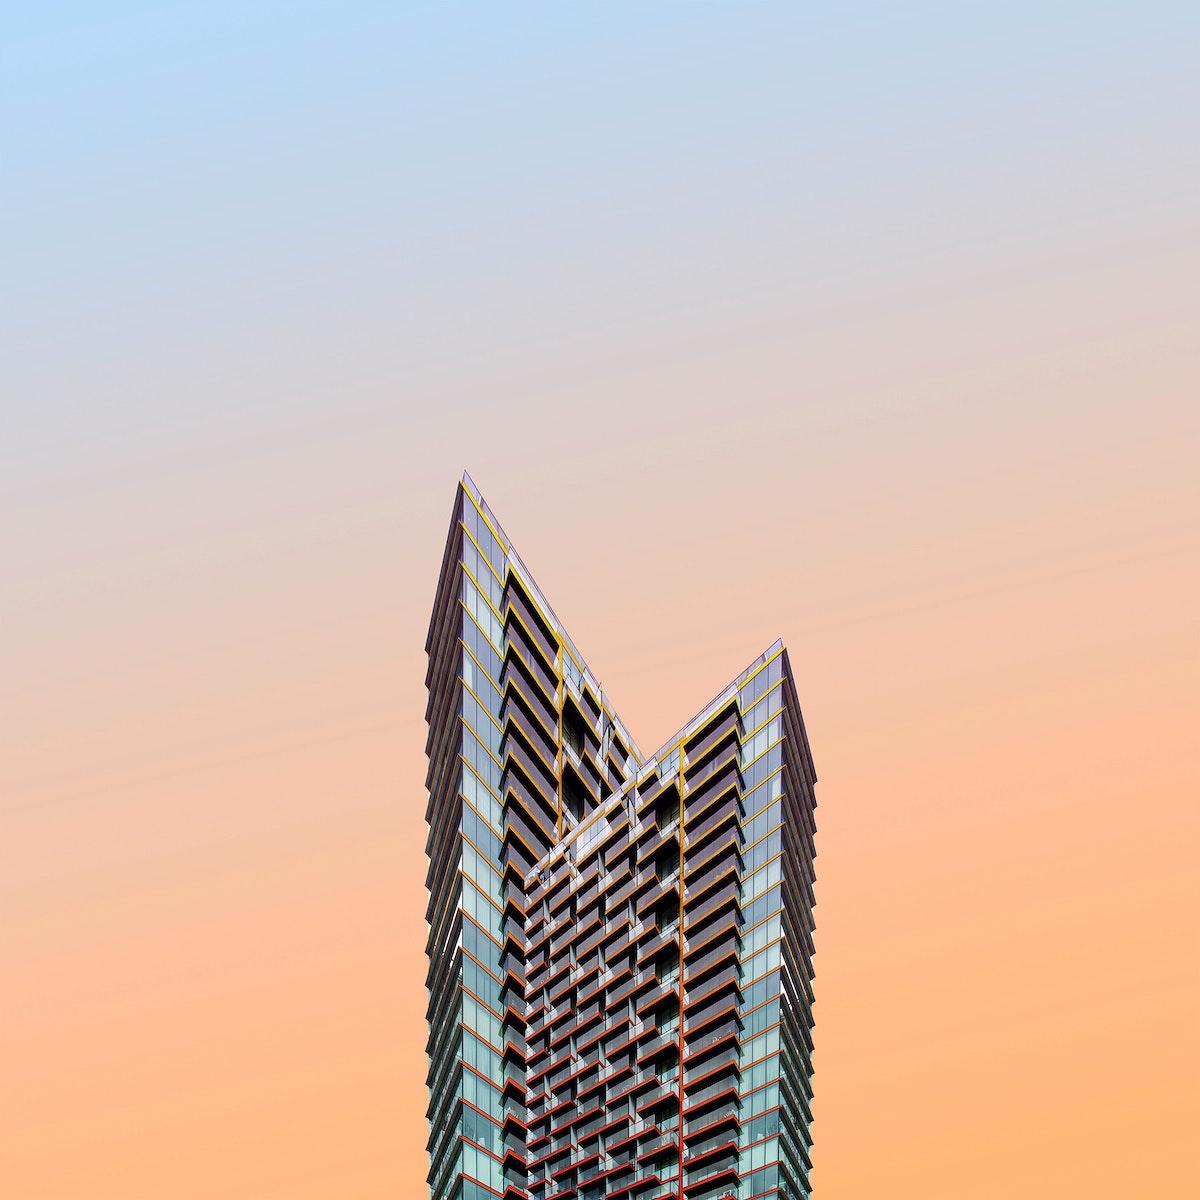 Barbican Centre, modern building in London, United Kingdom